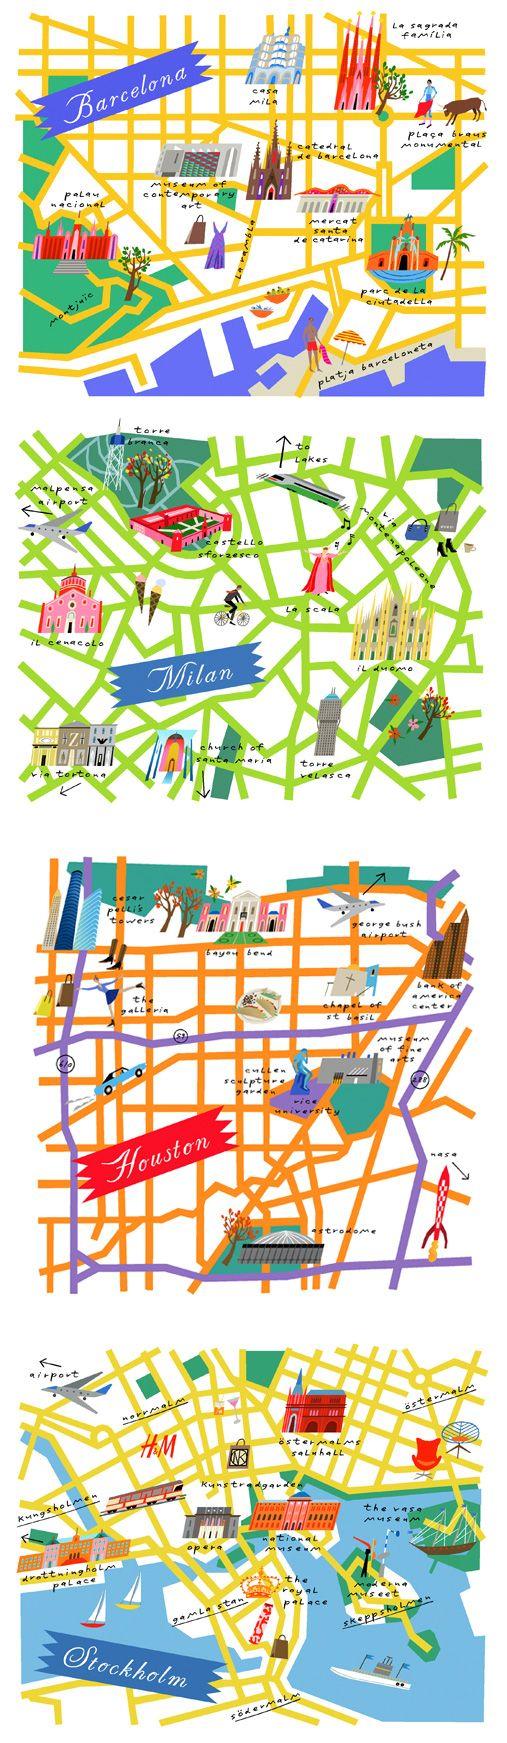 Lena Corwin - maps od Barcelona, Milan, Houston and Stockholm